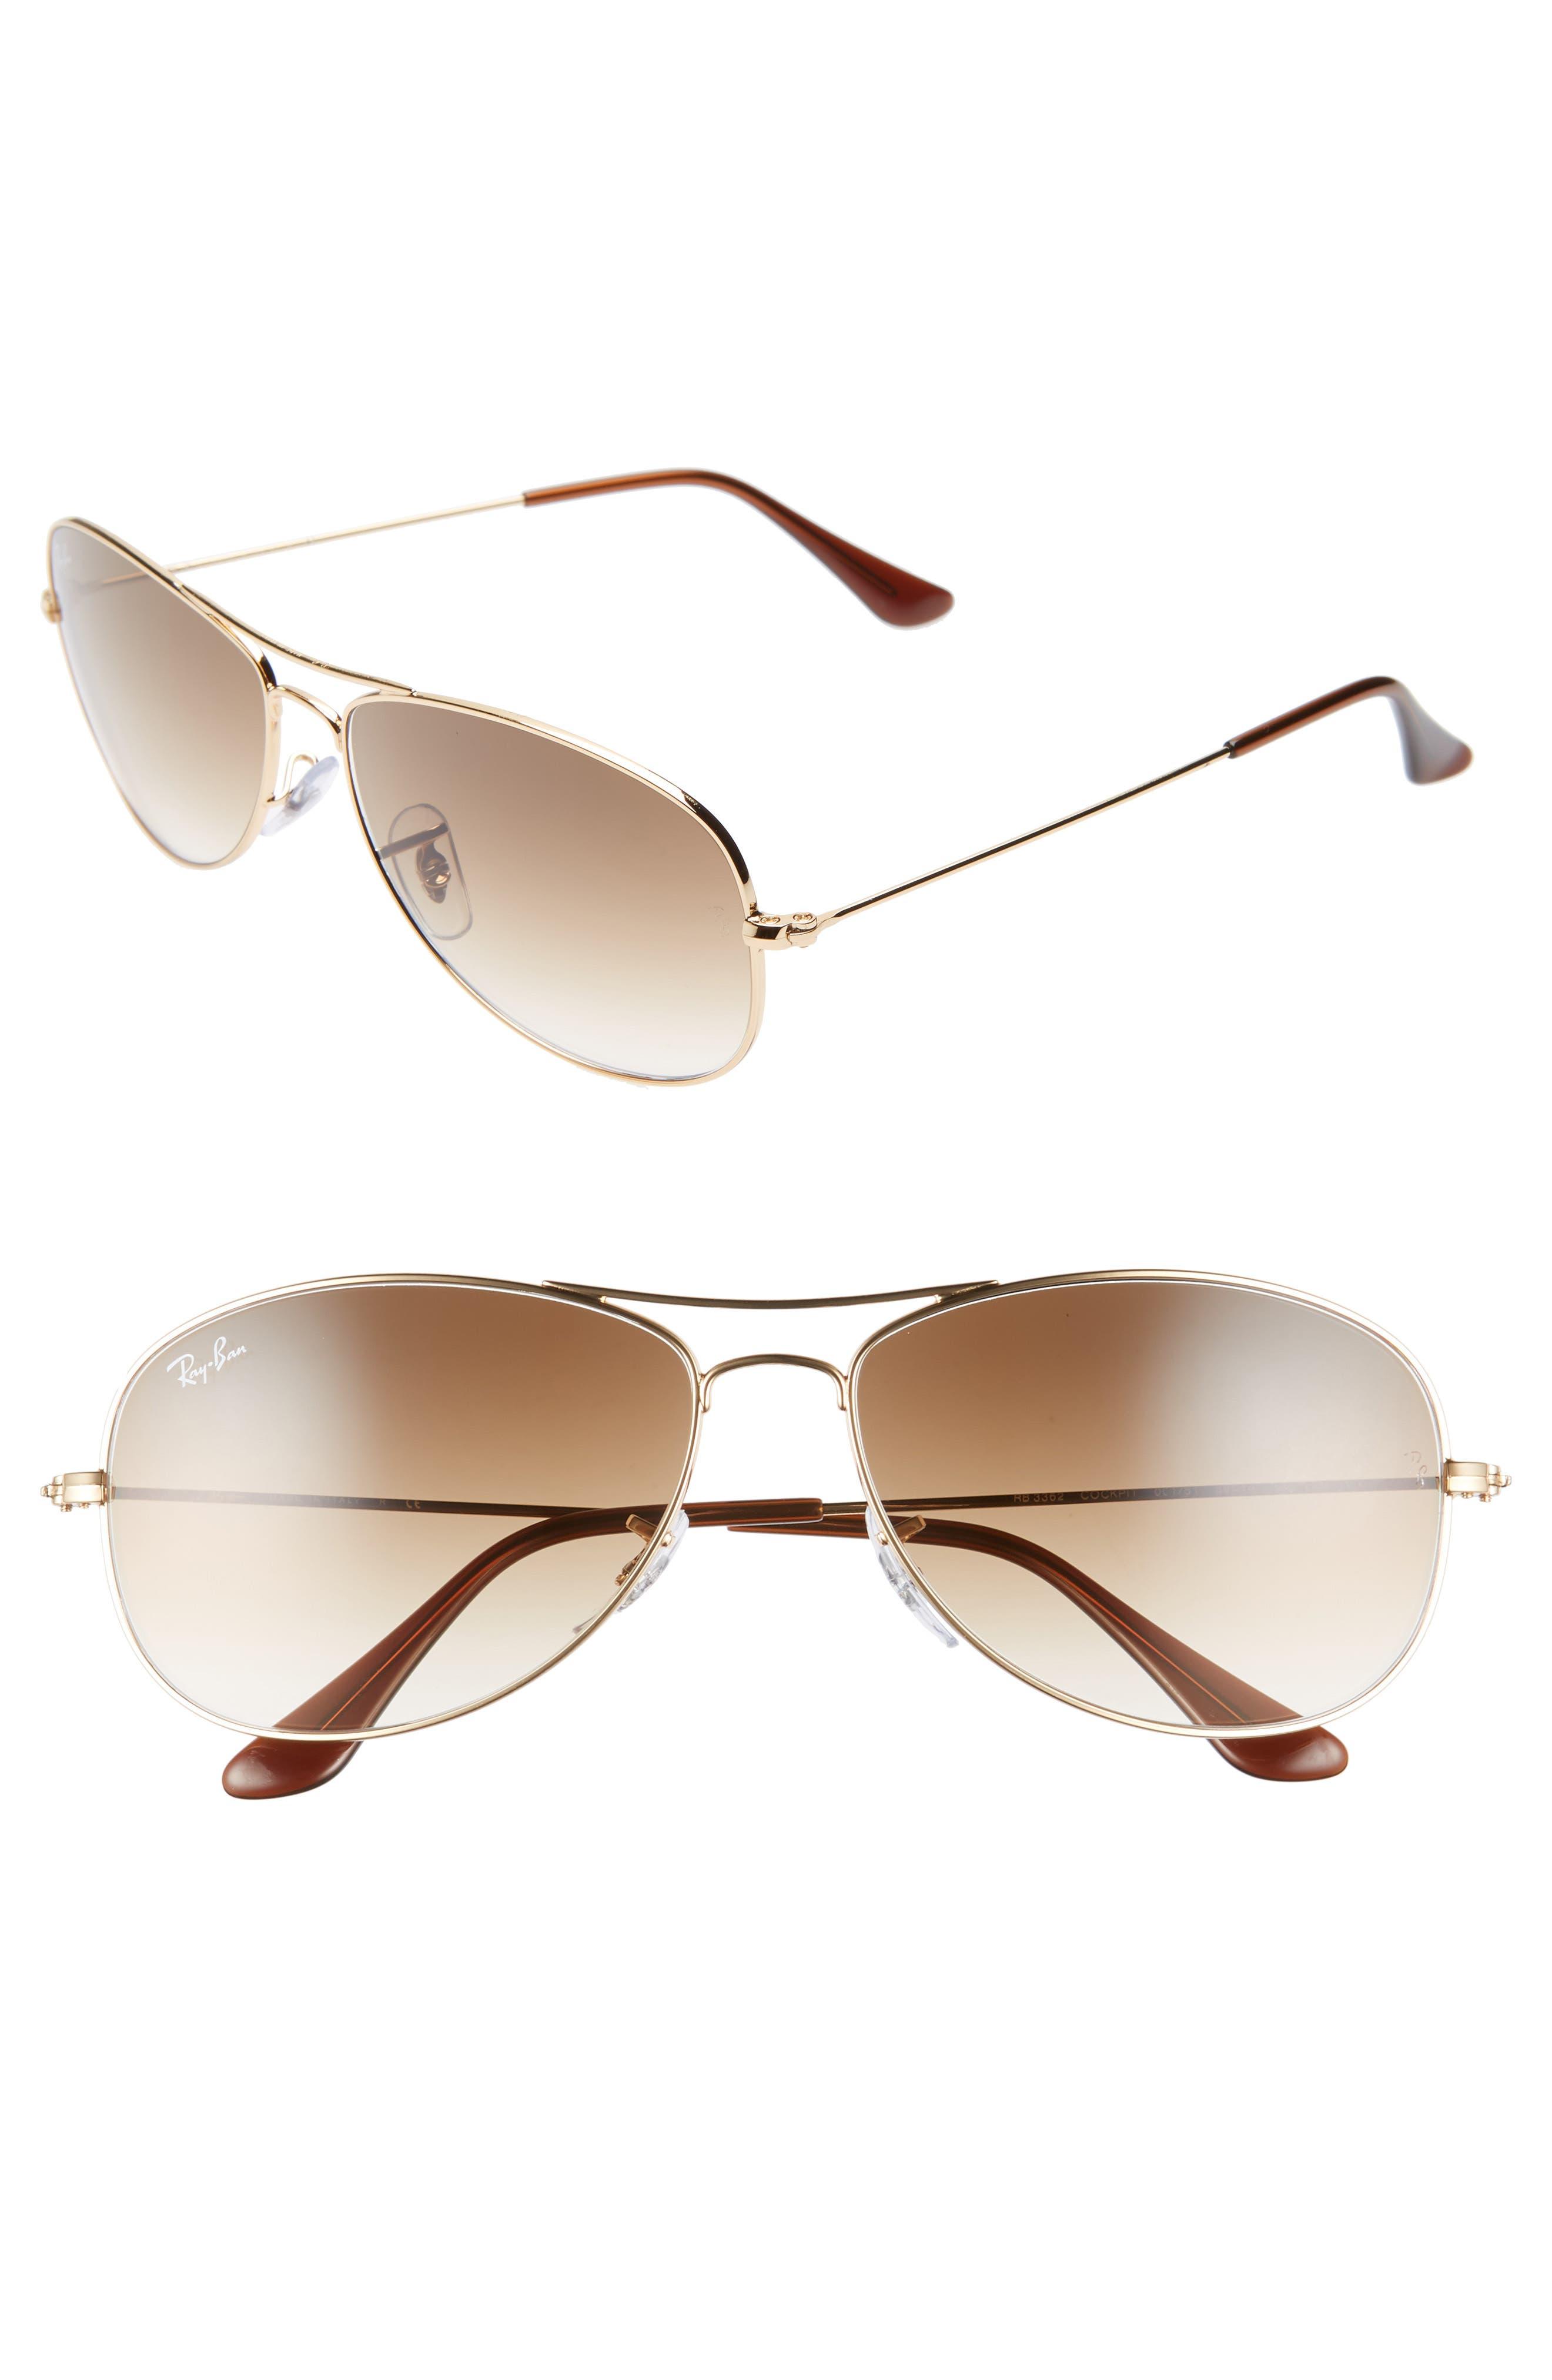 9e6e5095700 Ray-Ban Sunglasses for Women